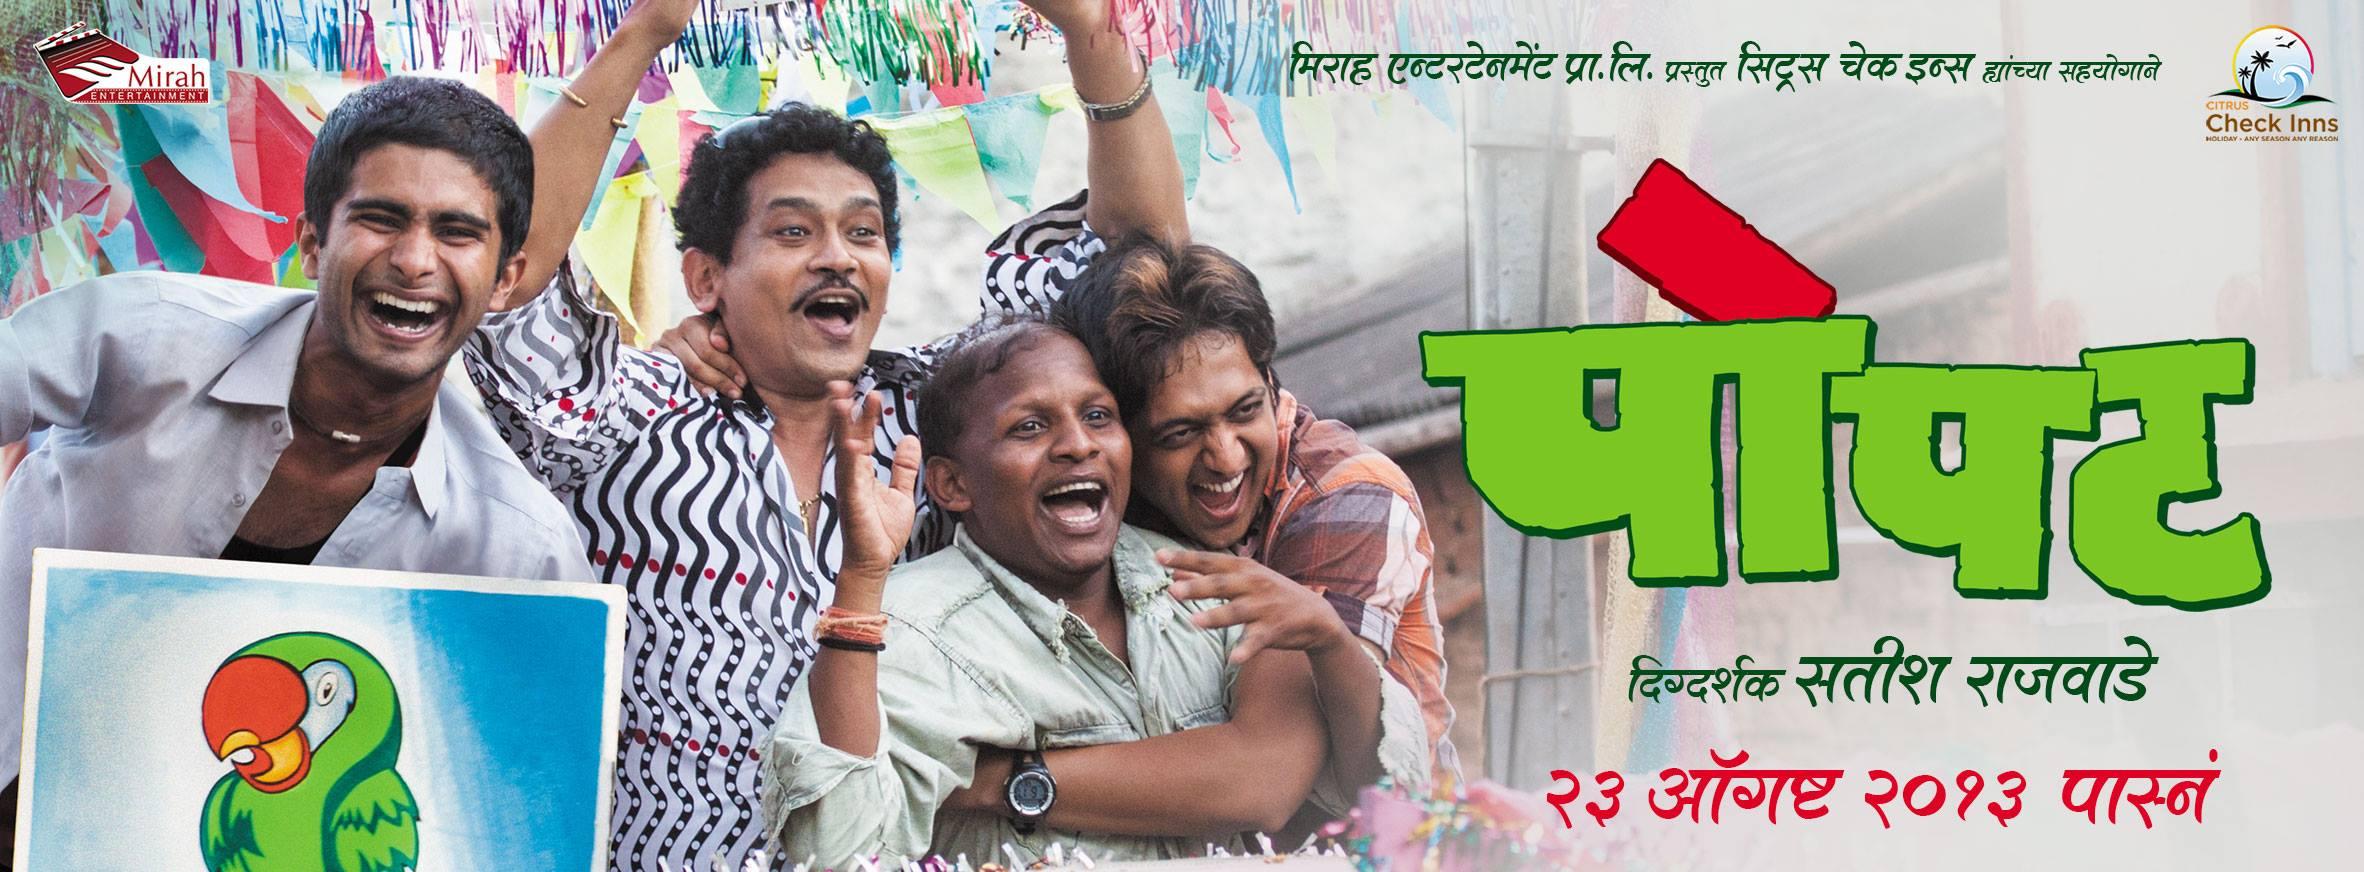 Miss match marathi movie kickass